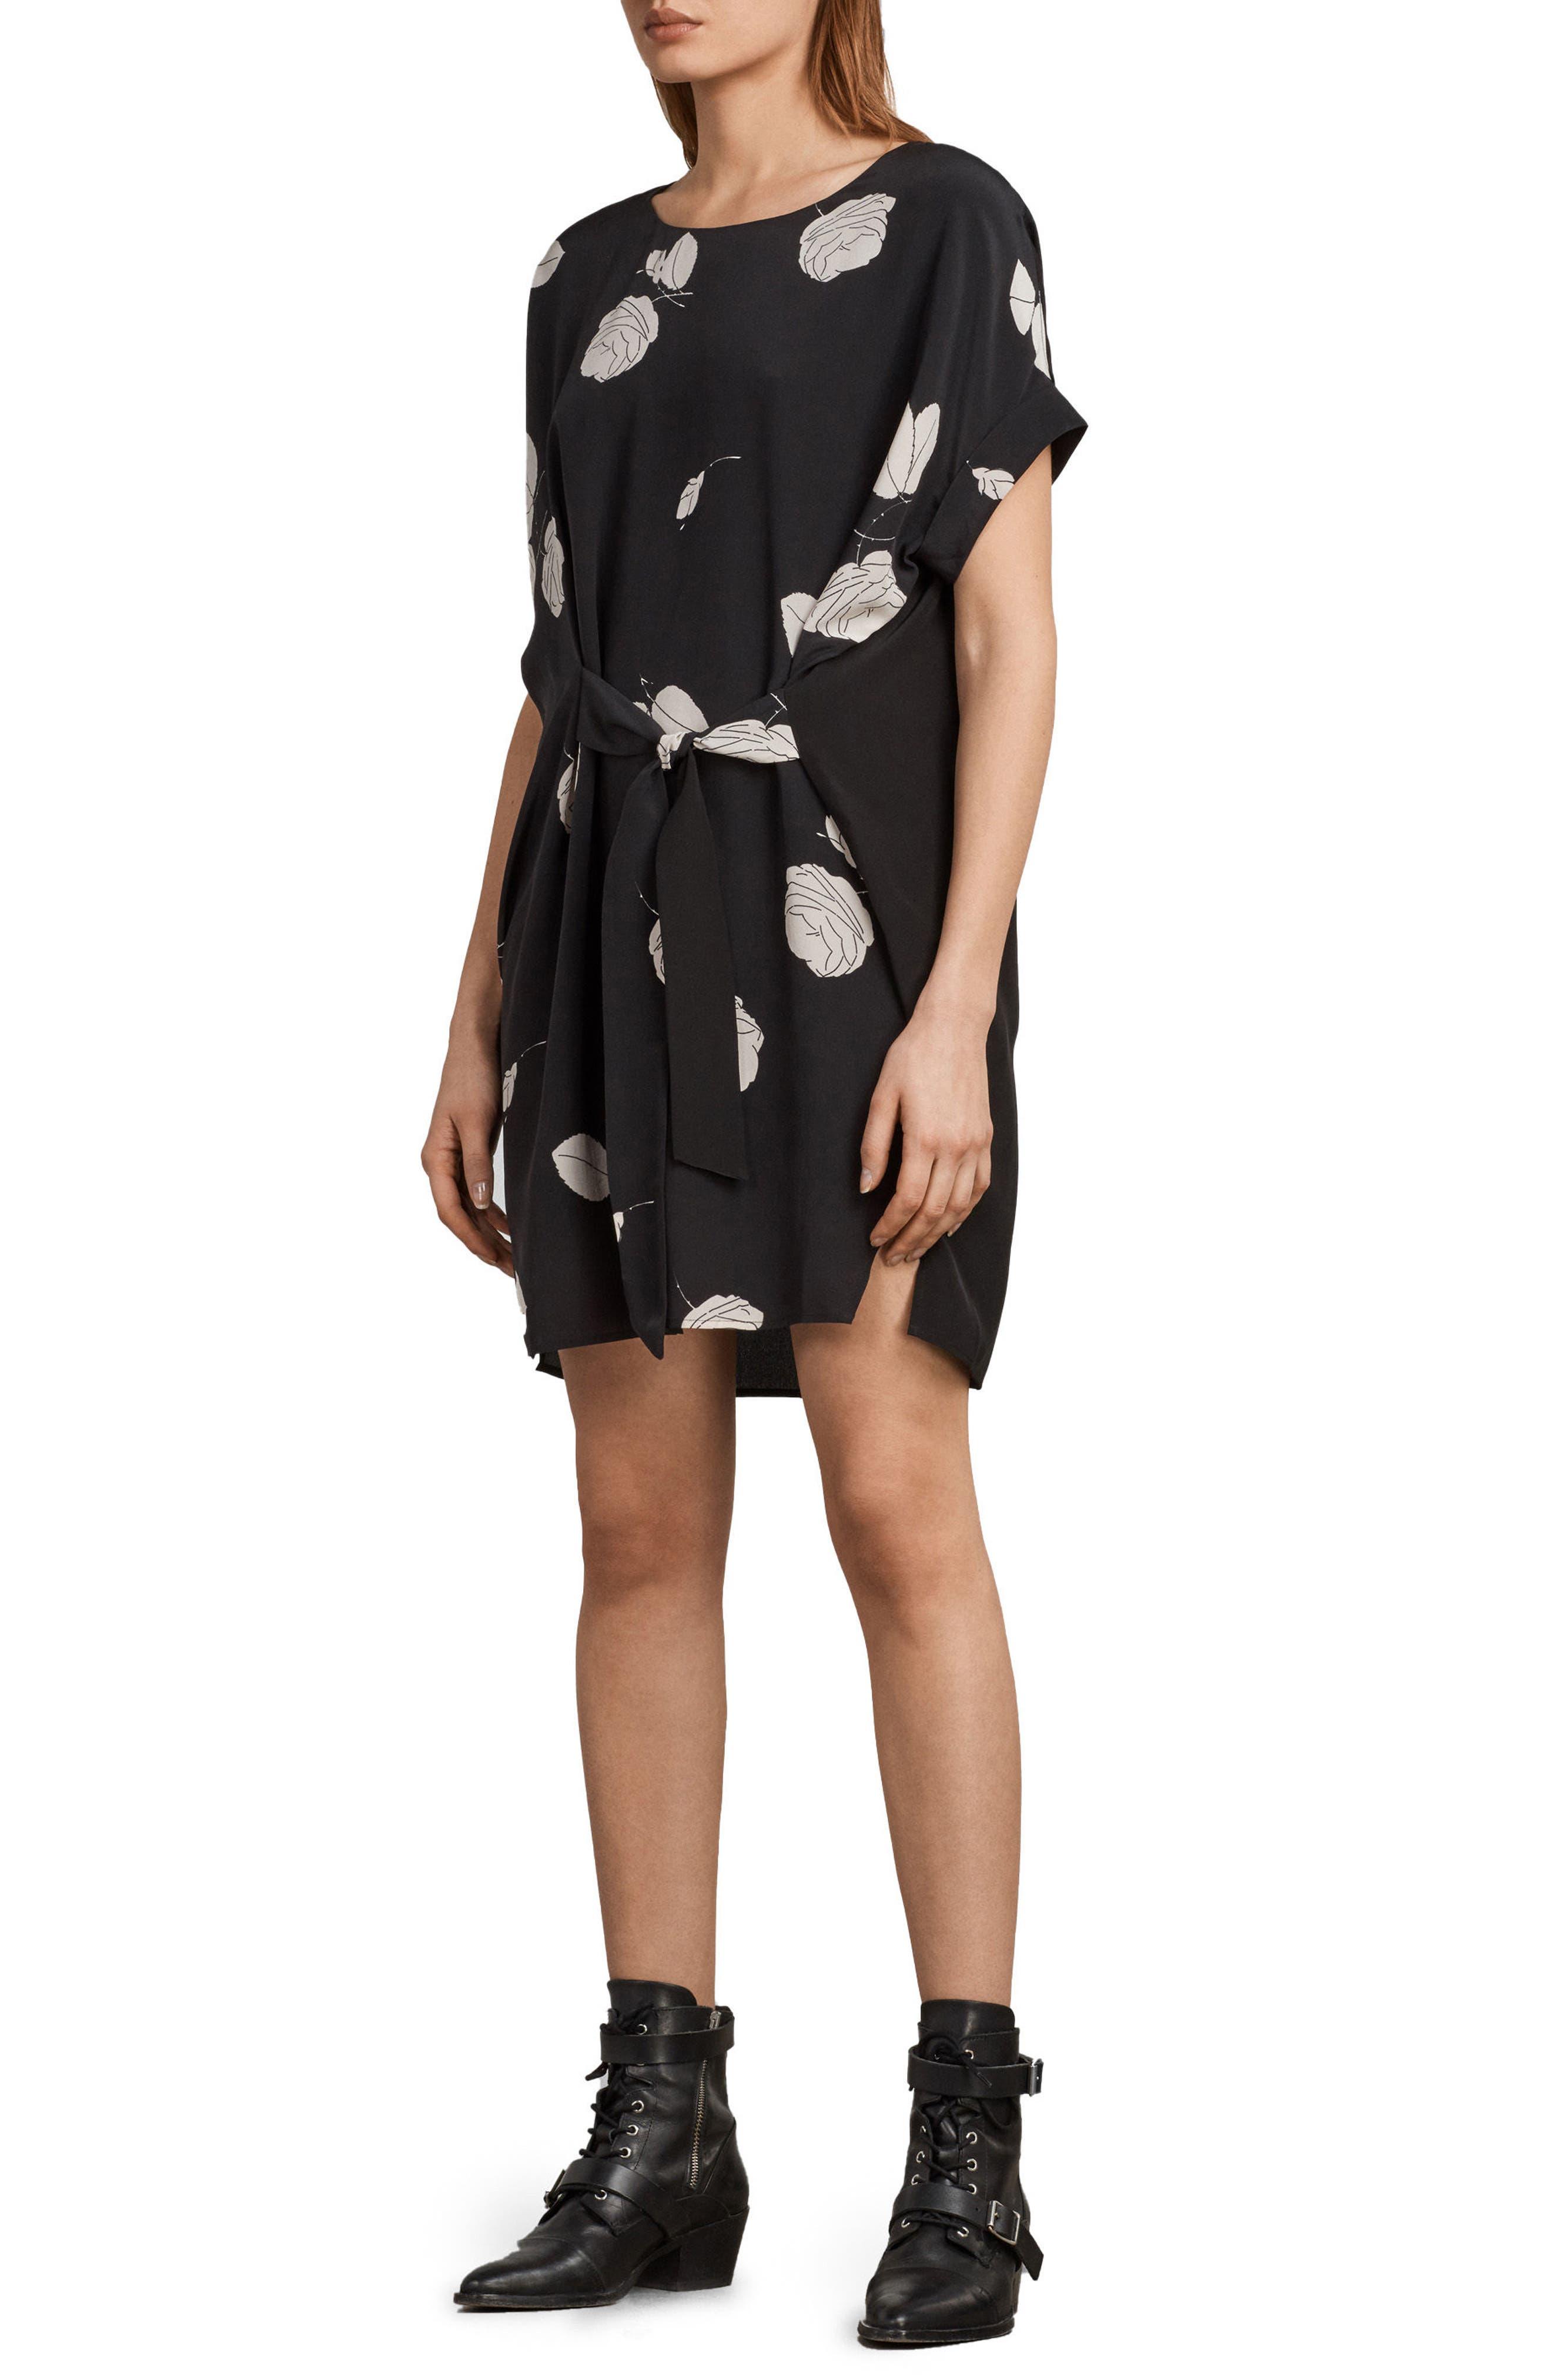 Sonny Rodin Silk Dress,                             Alternate thumbnail 5, color,                             Black